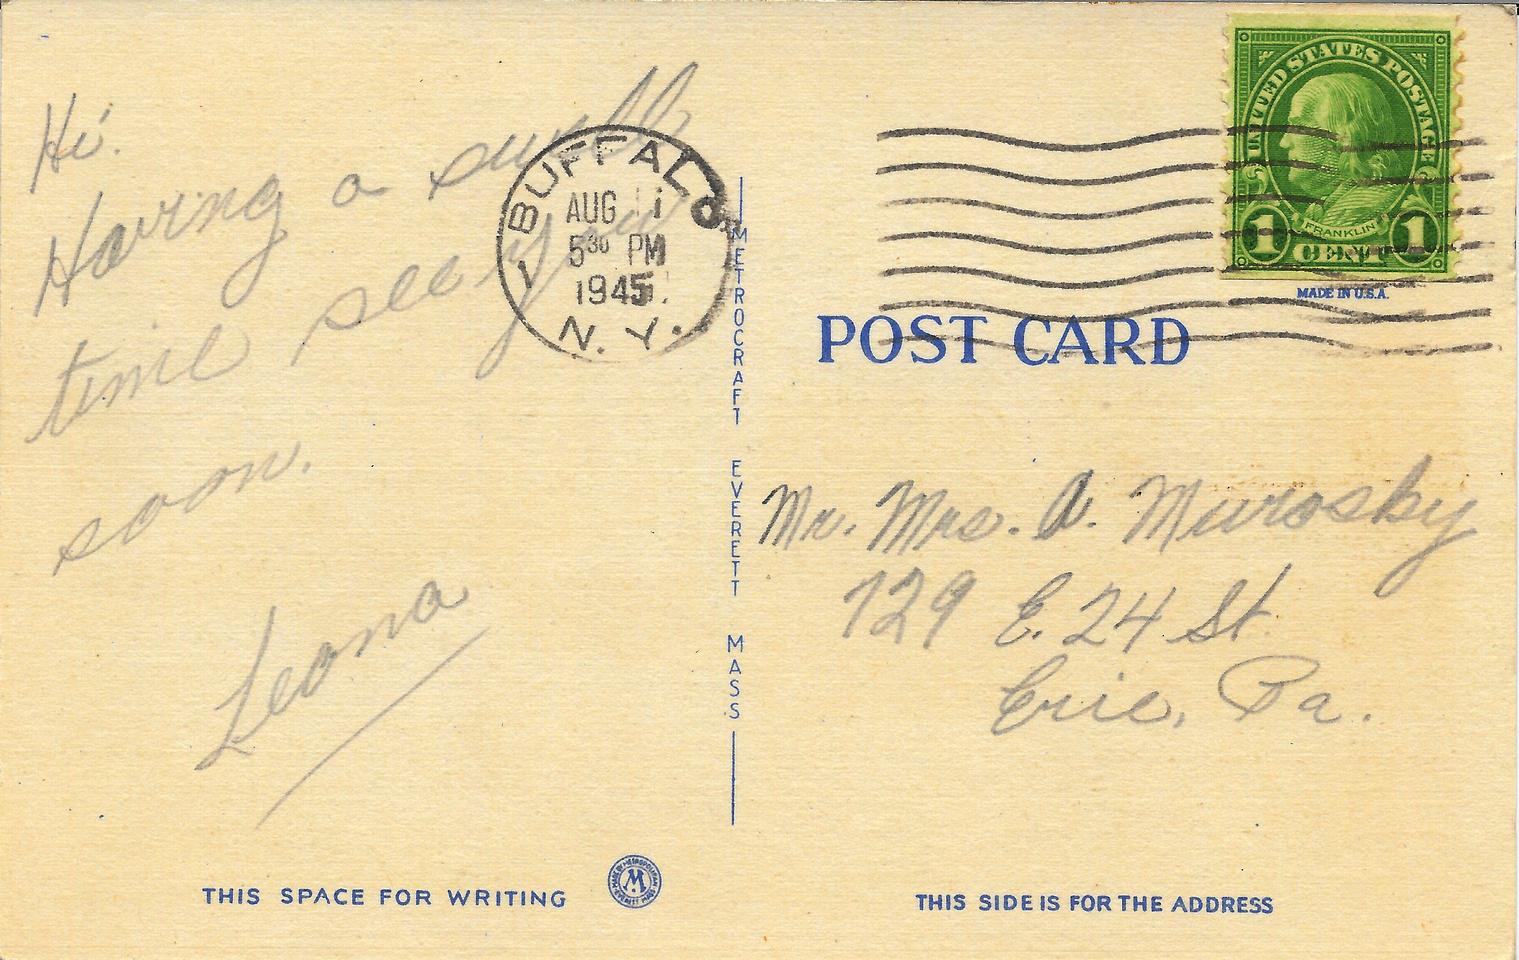 Michelle M. Murosky: The Postcard Collection &emdash; August 1945